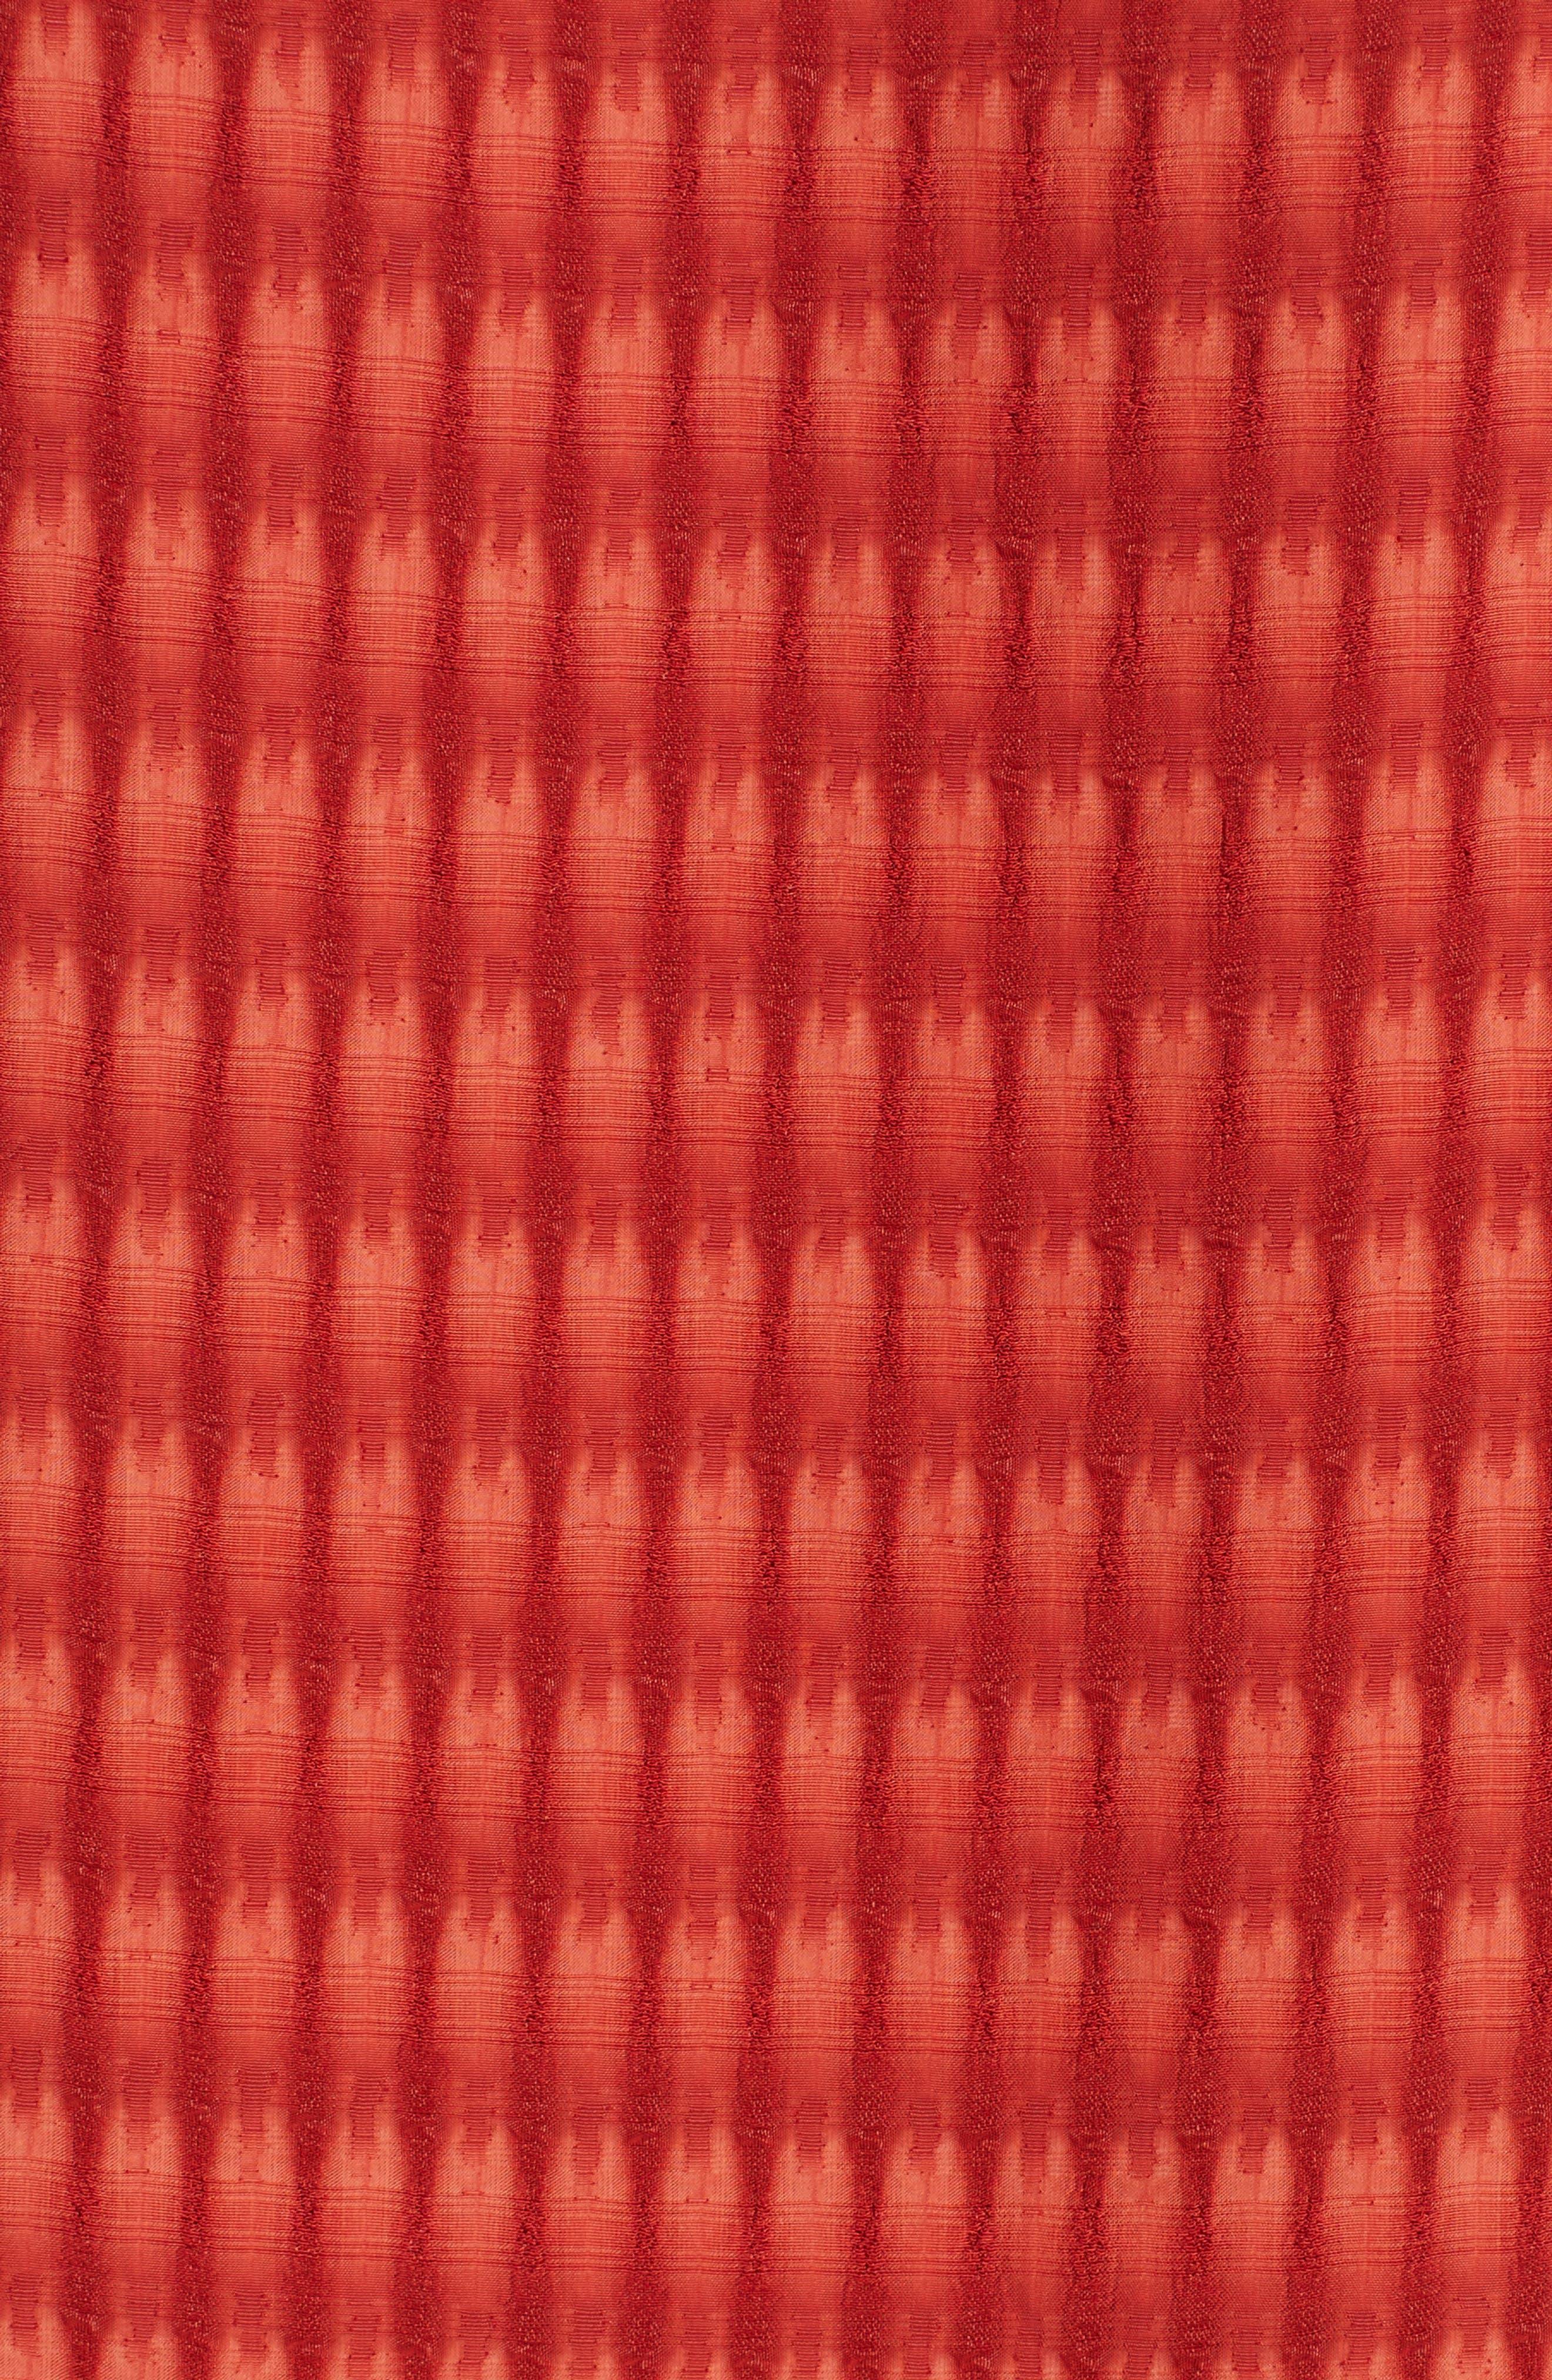 Alternate Image 3  - Zero + Maria Cornejo Vero Batik Plaid Top